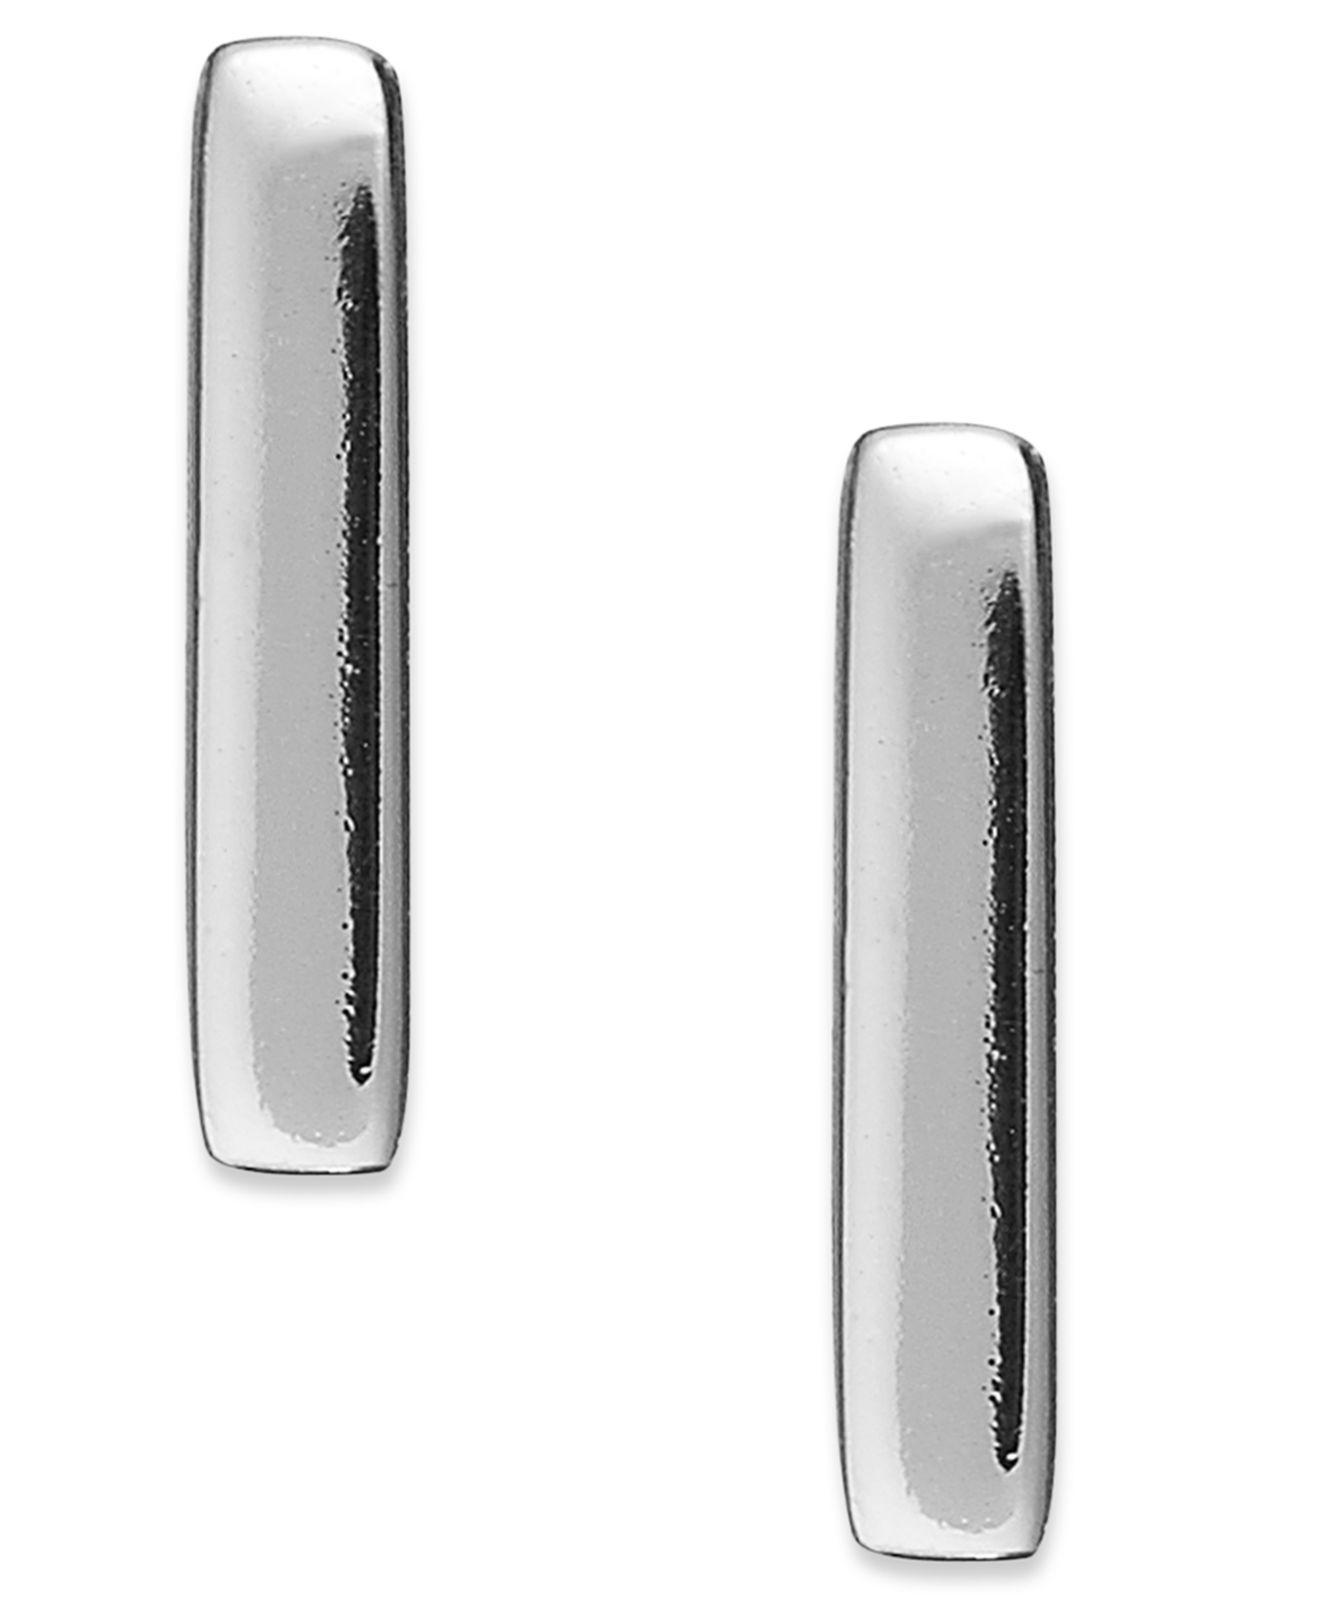 9922ad9eee5f07 Giani Bernini 18k Gold Over Sterling Silver Bar Stud Earrings in ...